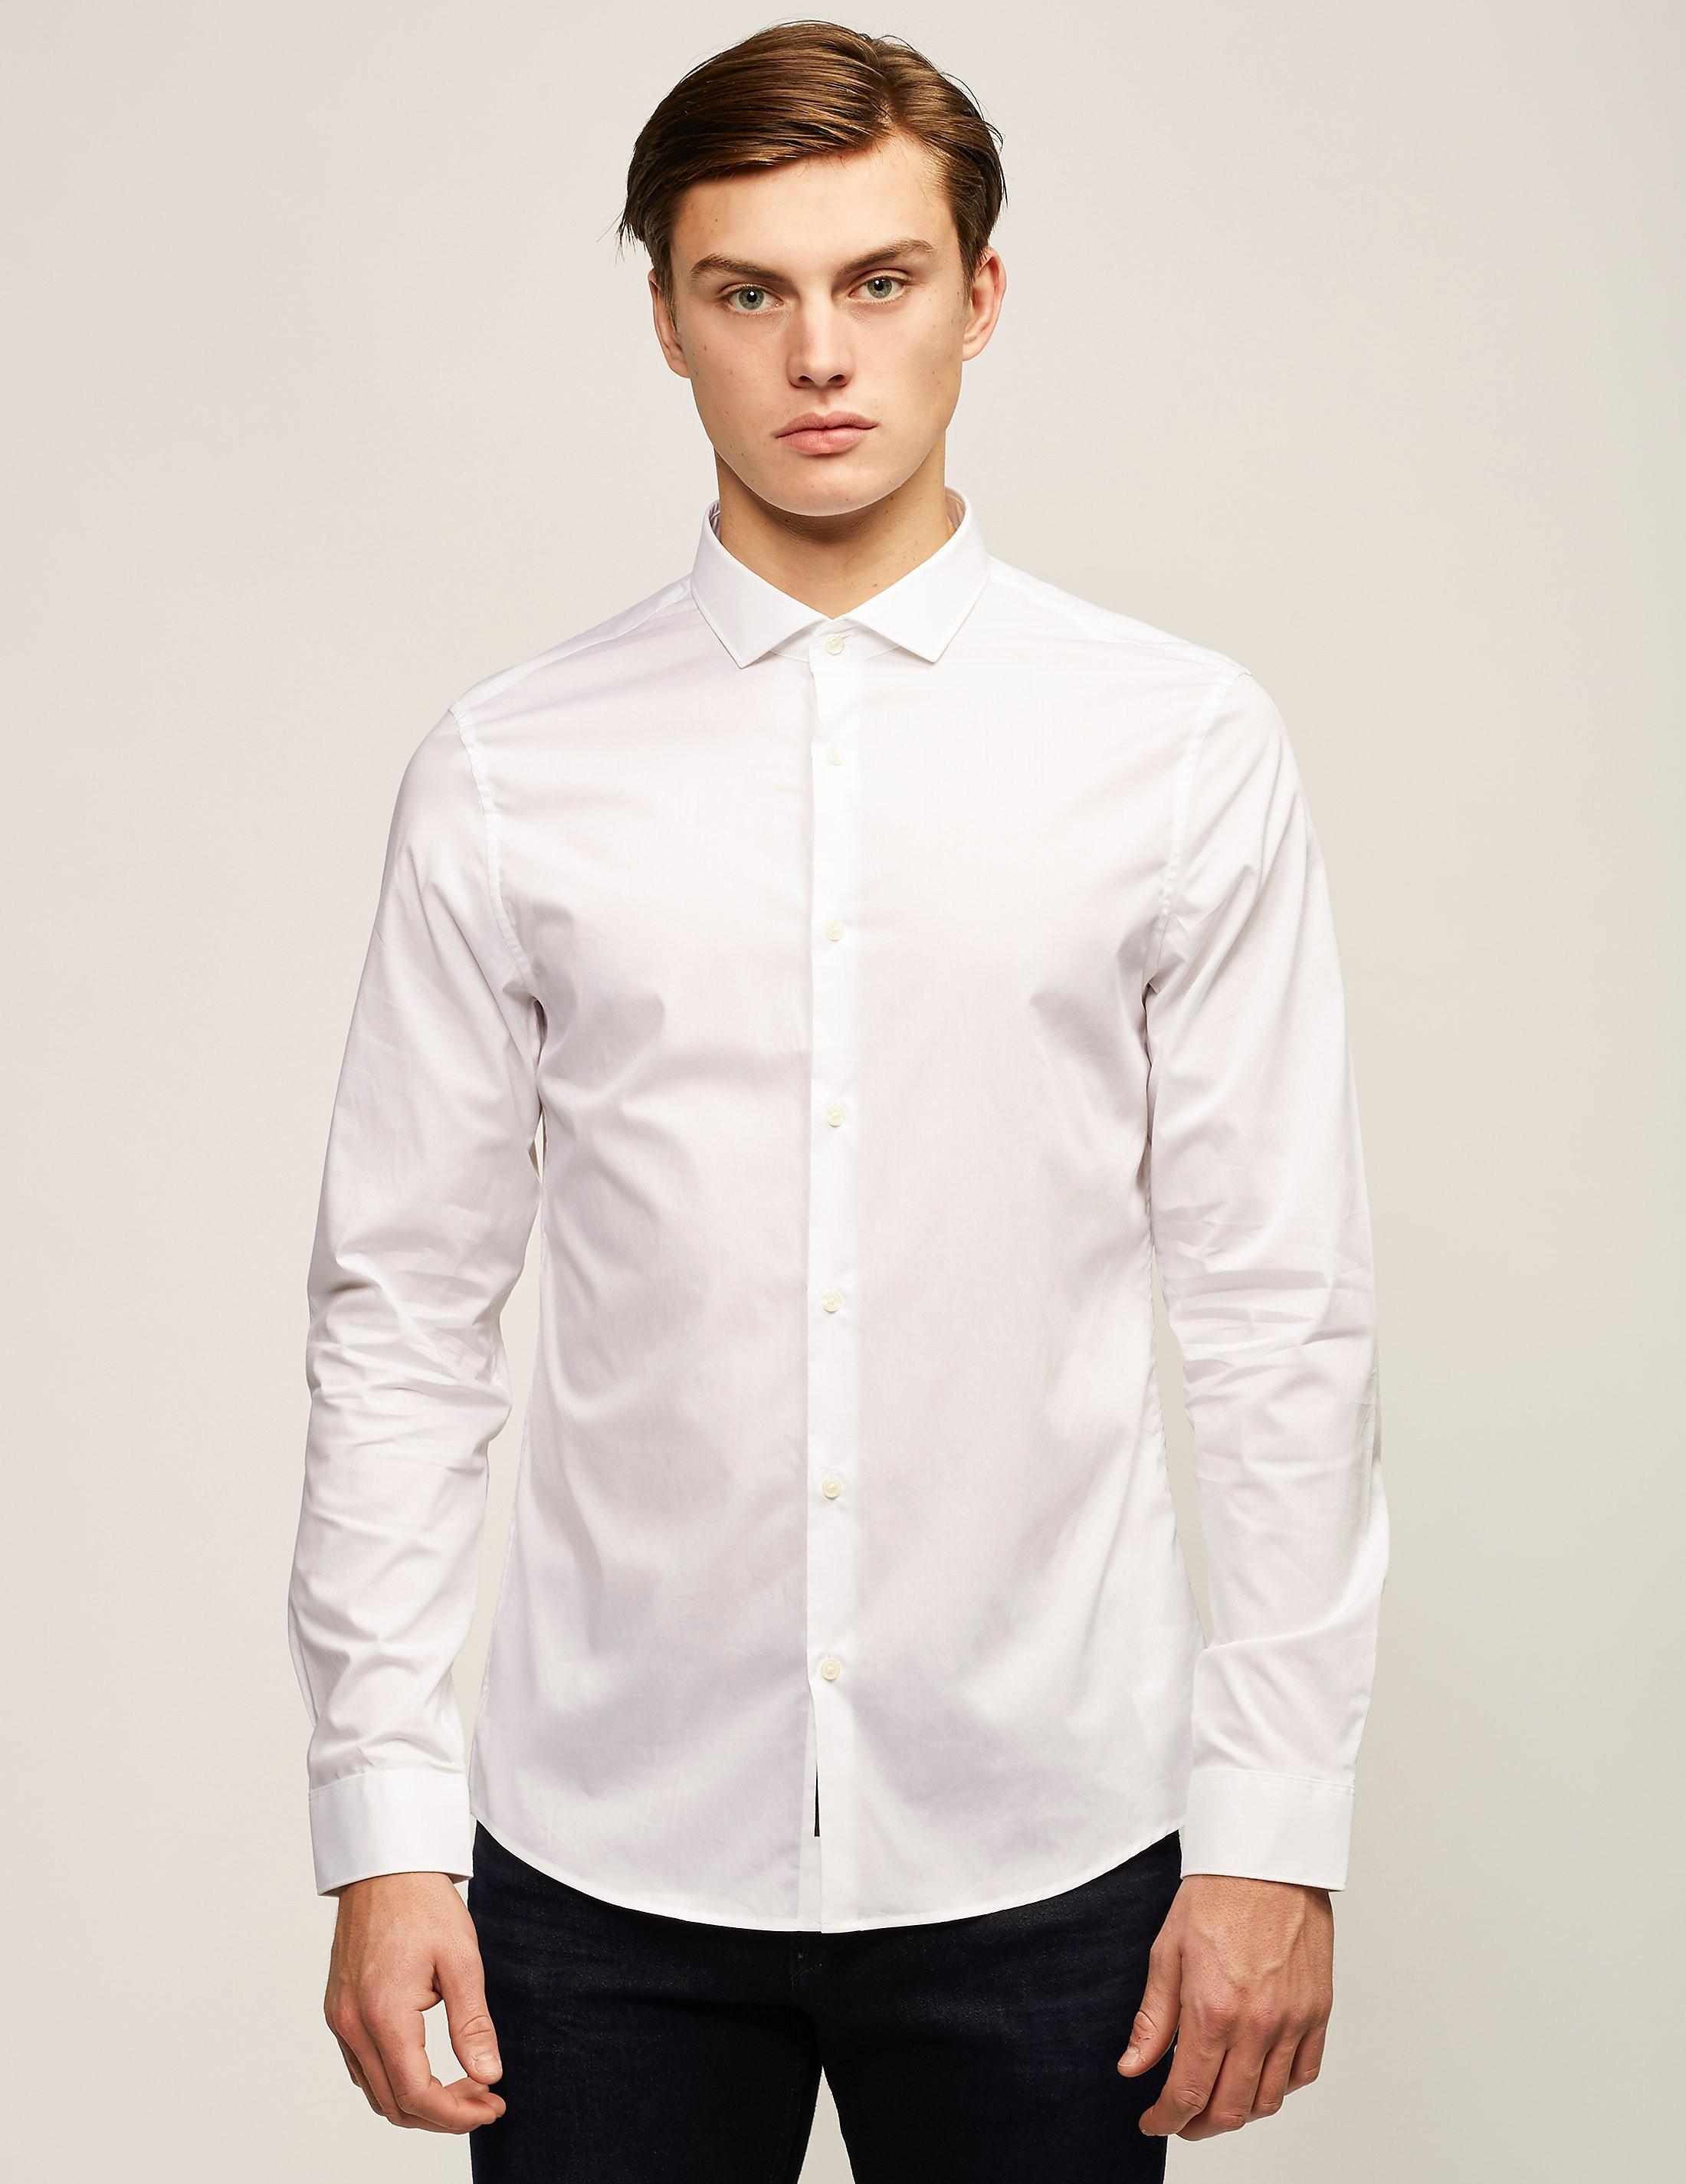 Michael Kors Slim Fit Cotton Stretch Long Sleeve Shirt